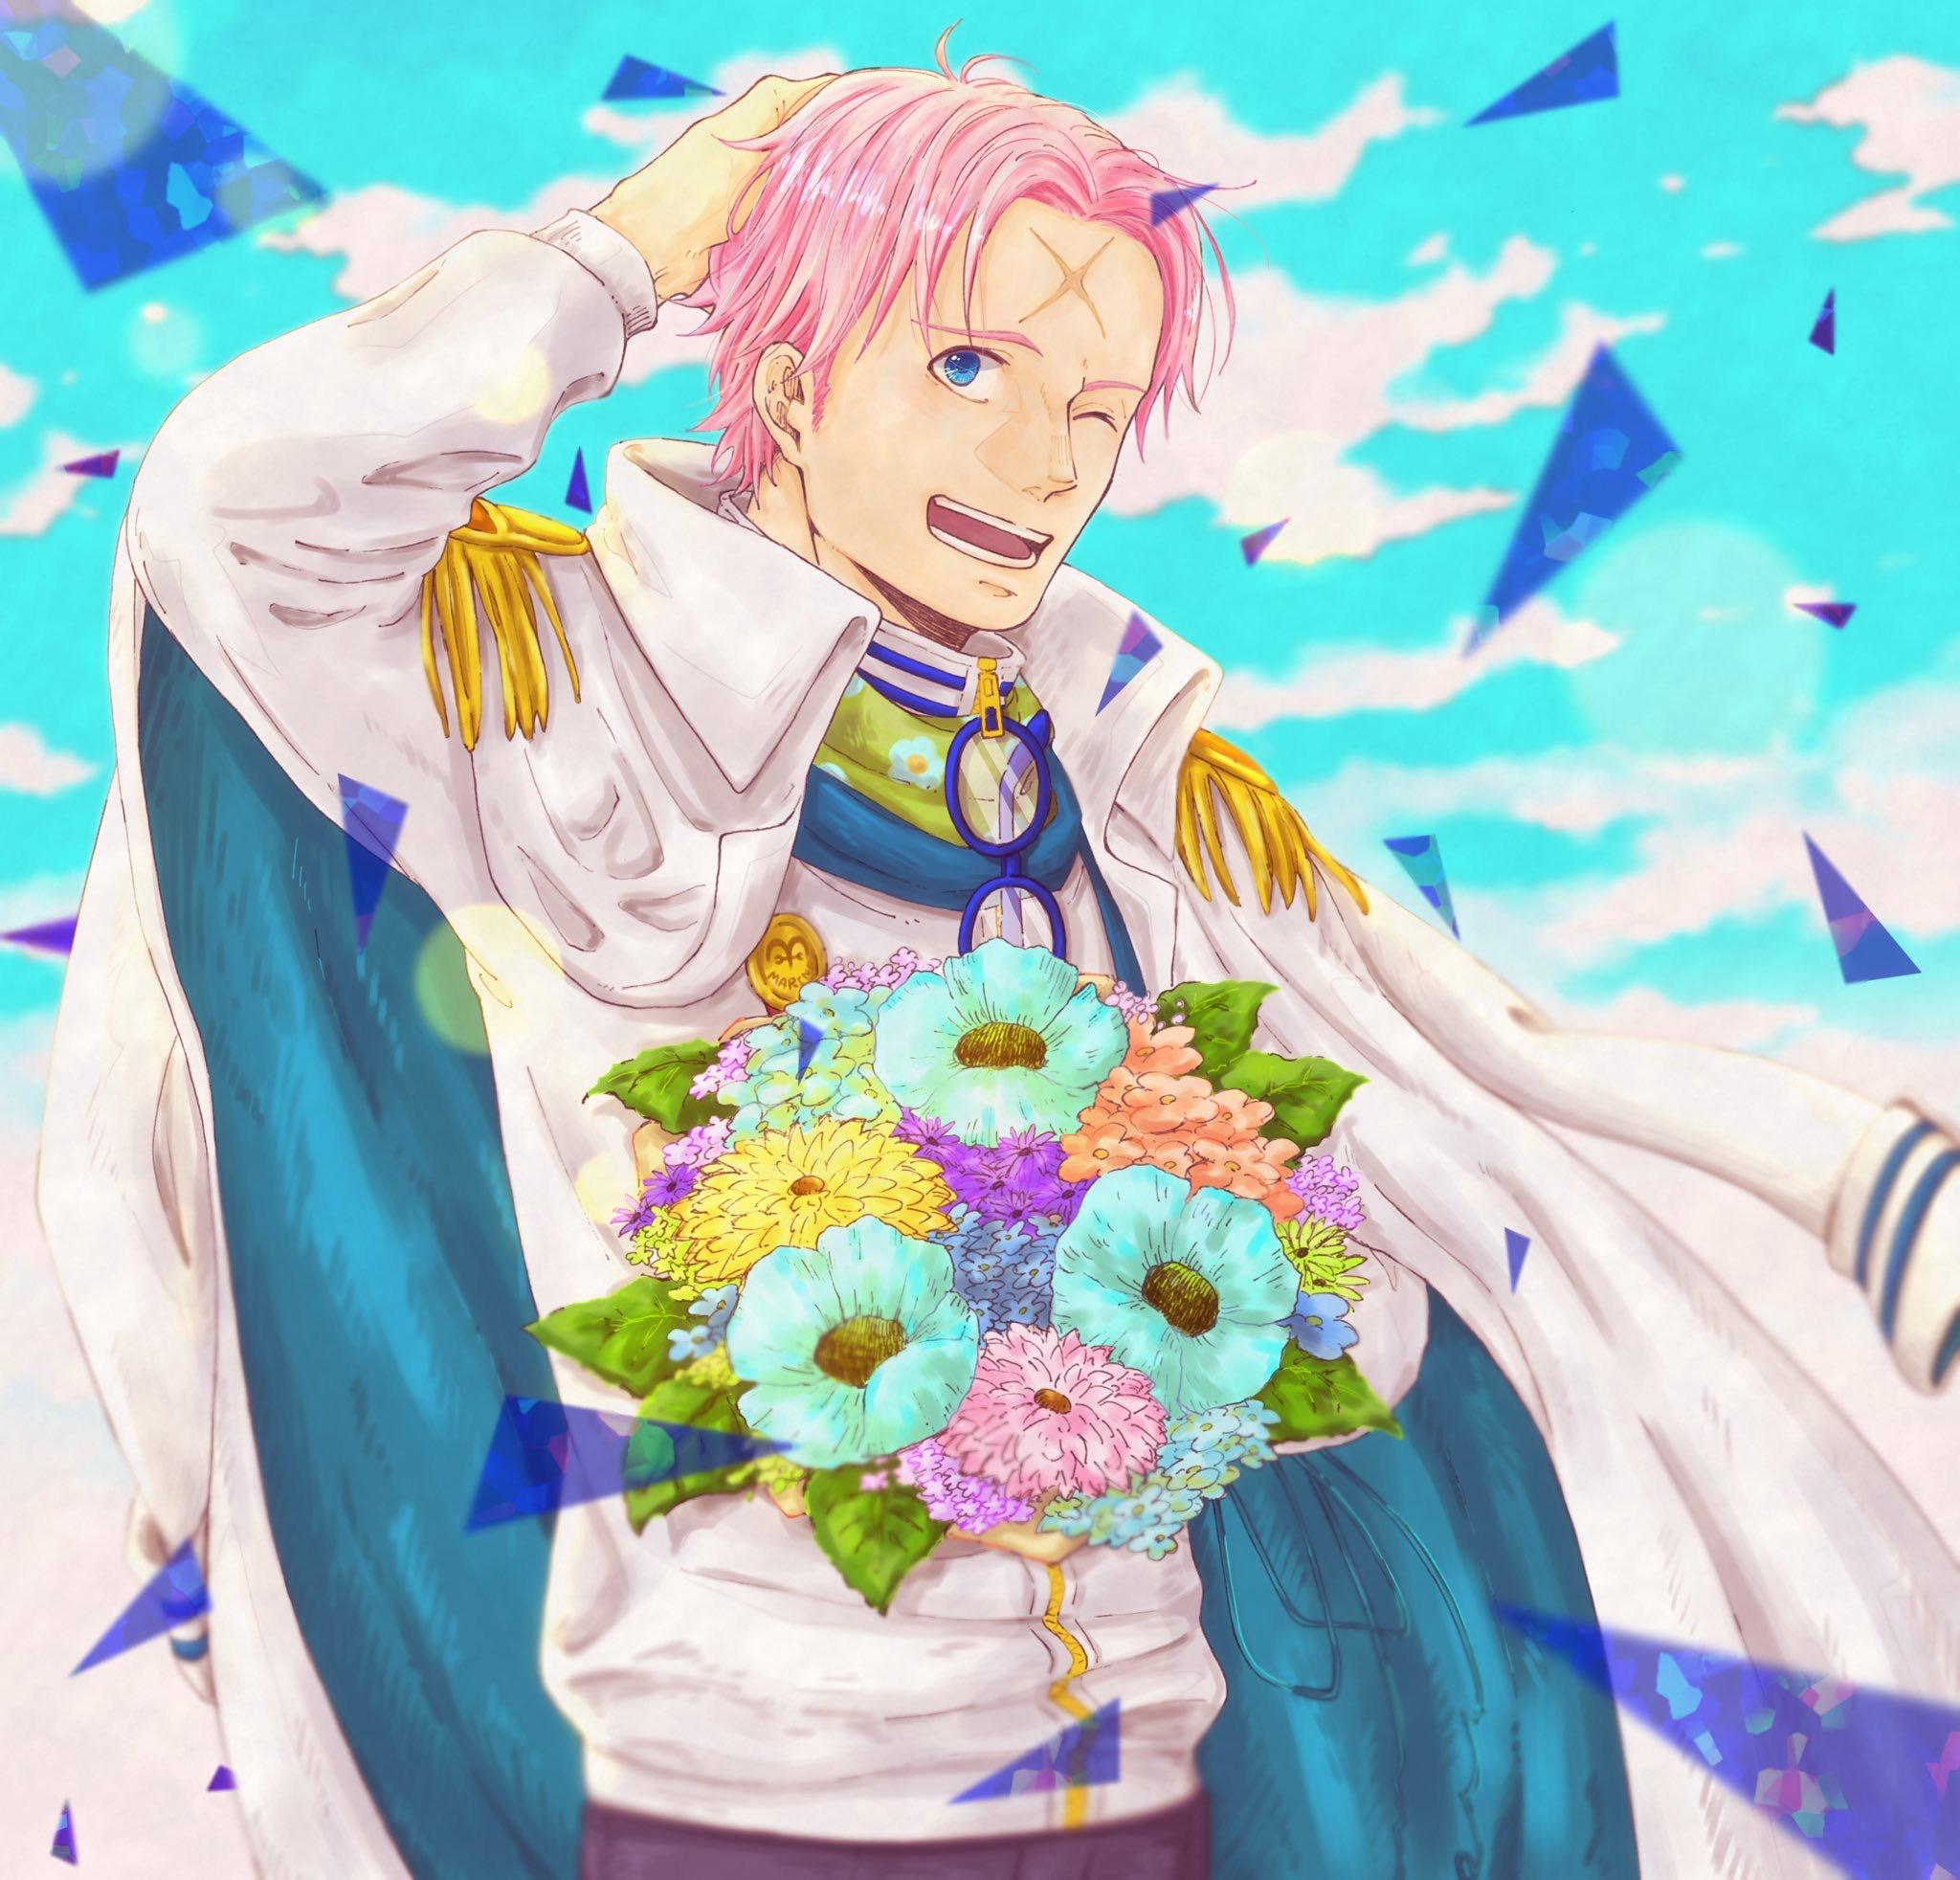 Coby - ONE PIECE - Image #2750599 - Zerochan Anime Image Board